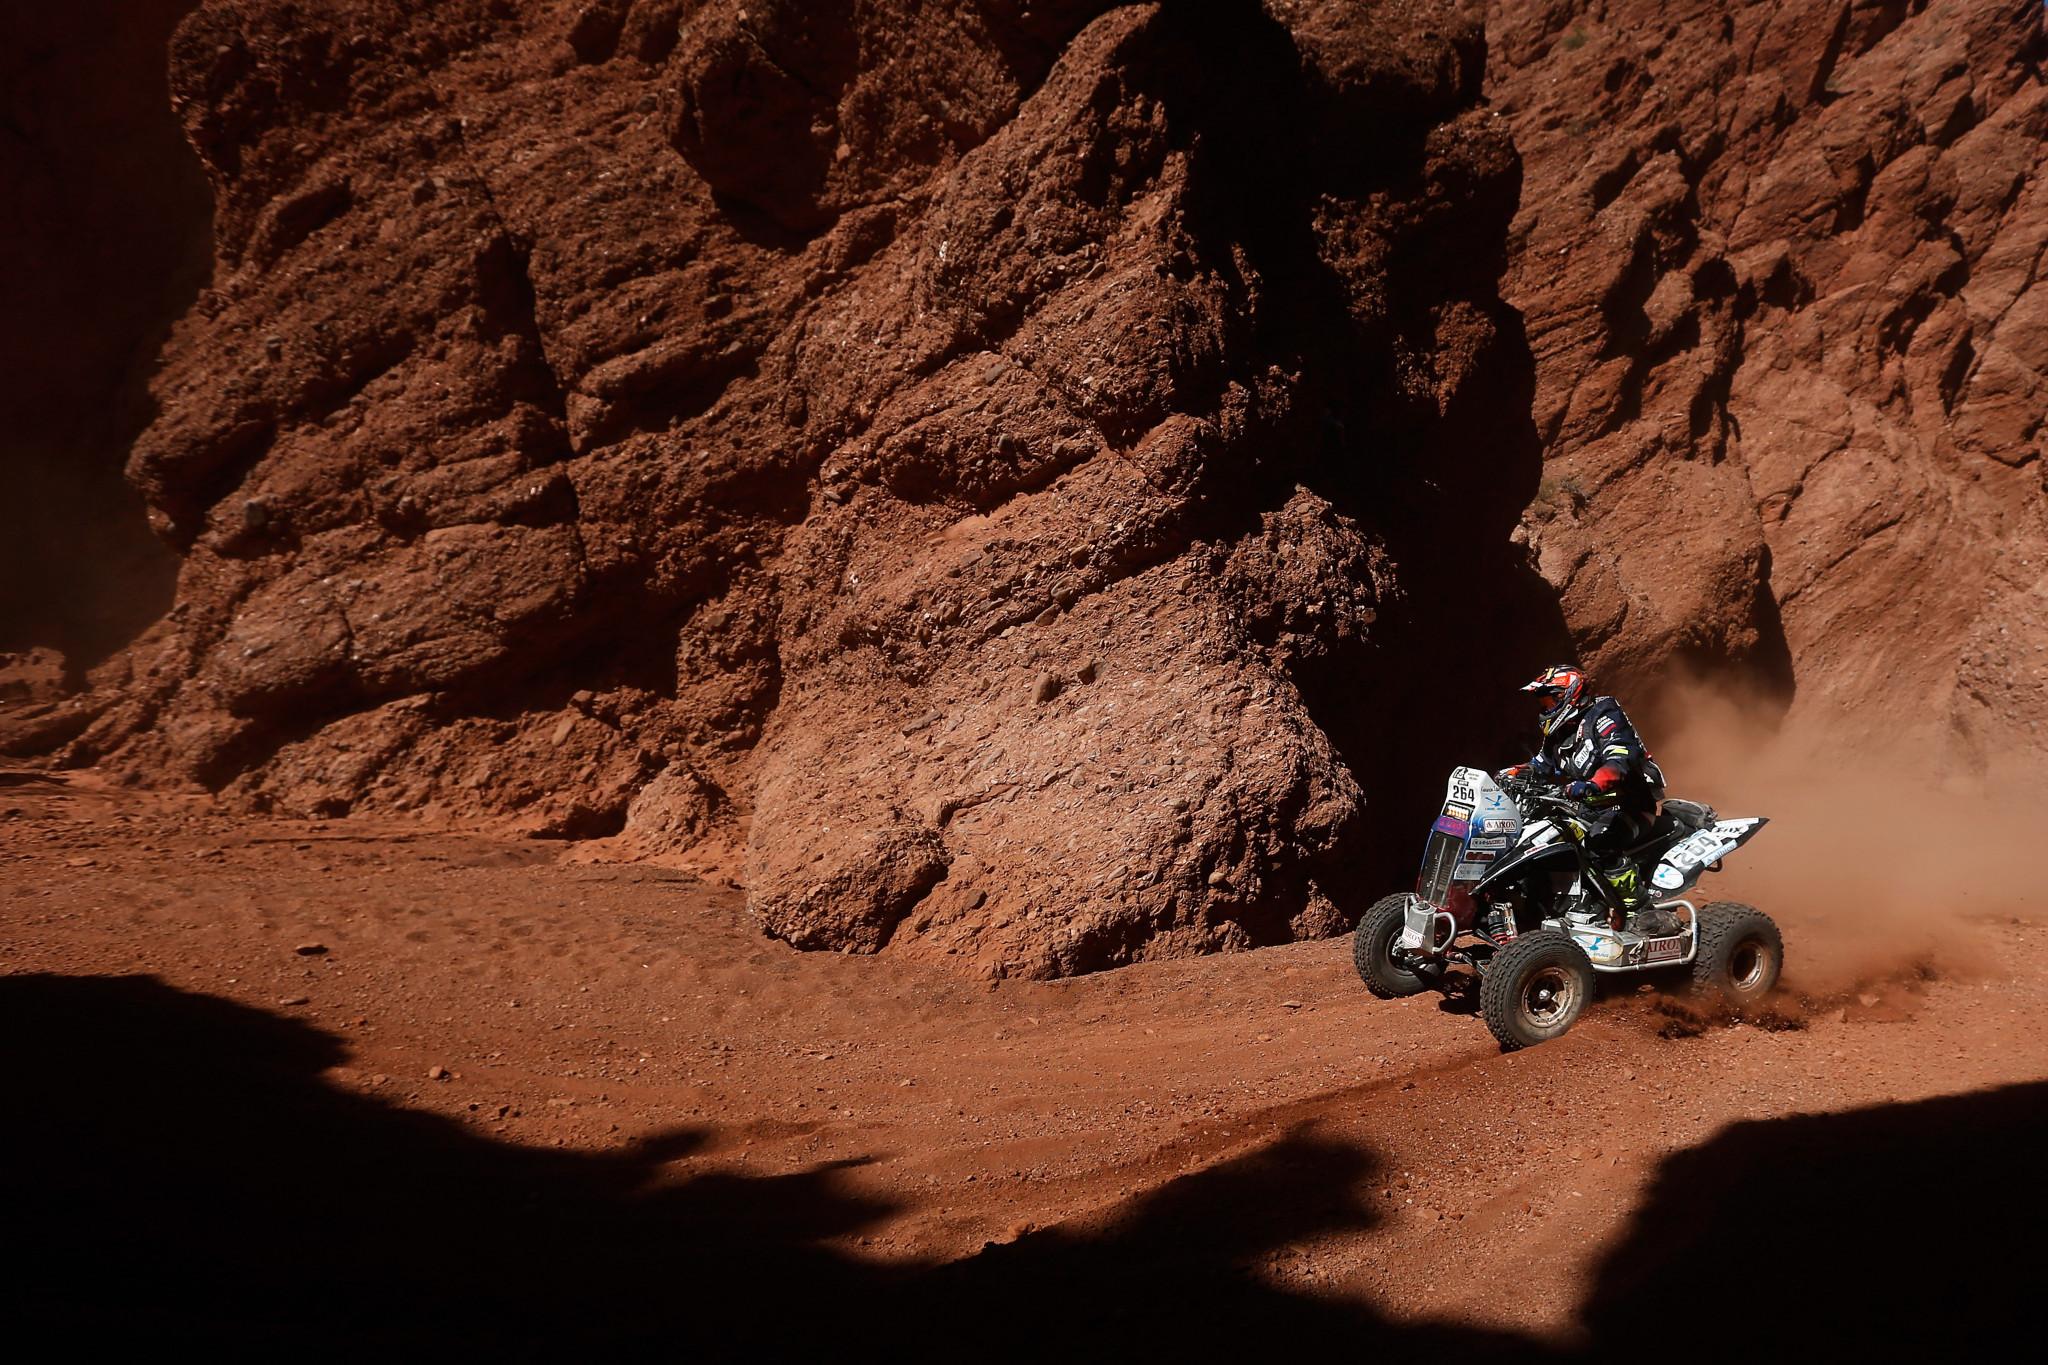 Sergei Karyakin won the Dakar Rally for quad bikes in 2017 ©Getty Images